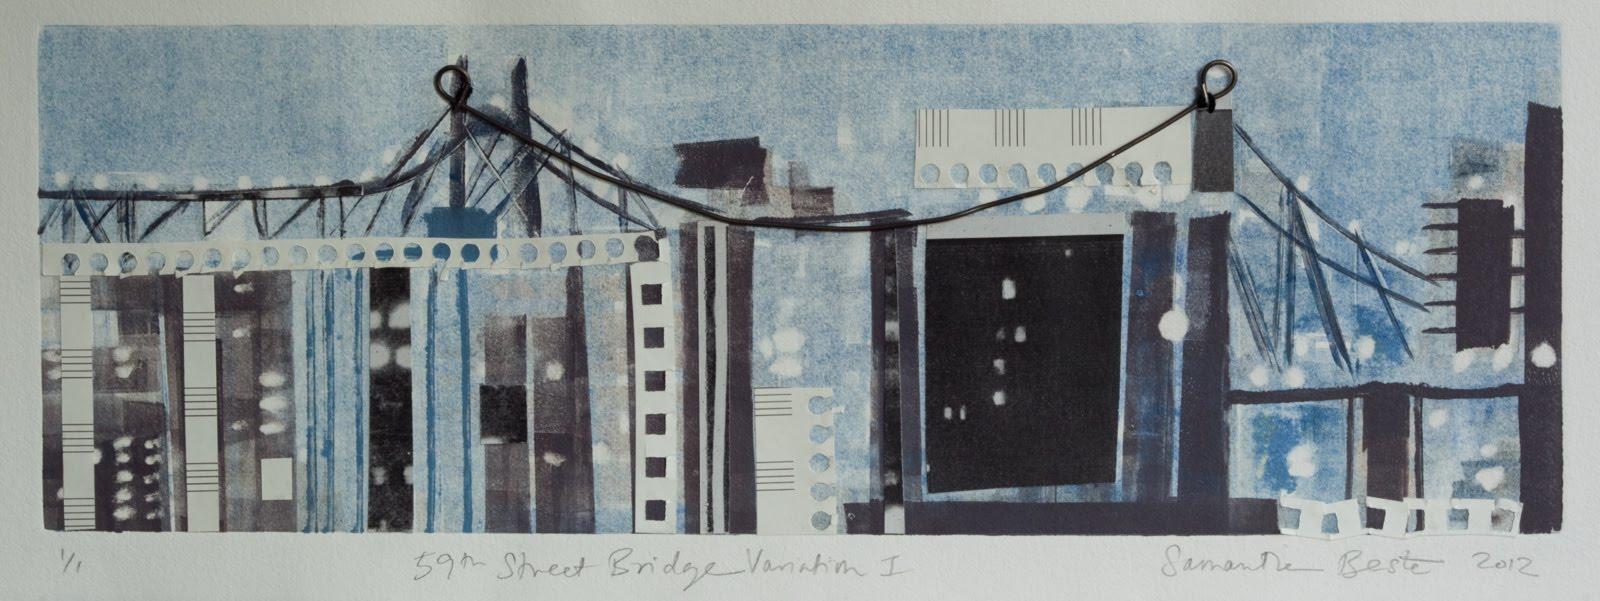 """59th Street Bridge Variation I"", monotype/collage, 12x24 in."